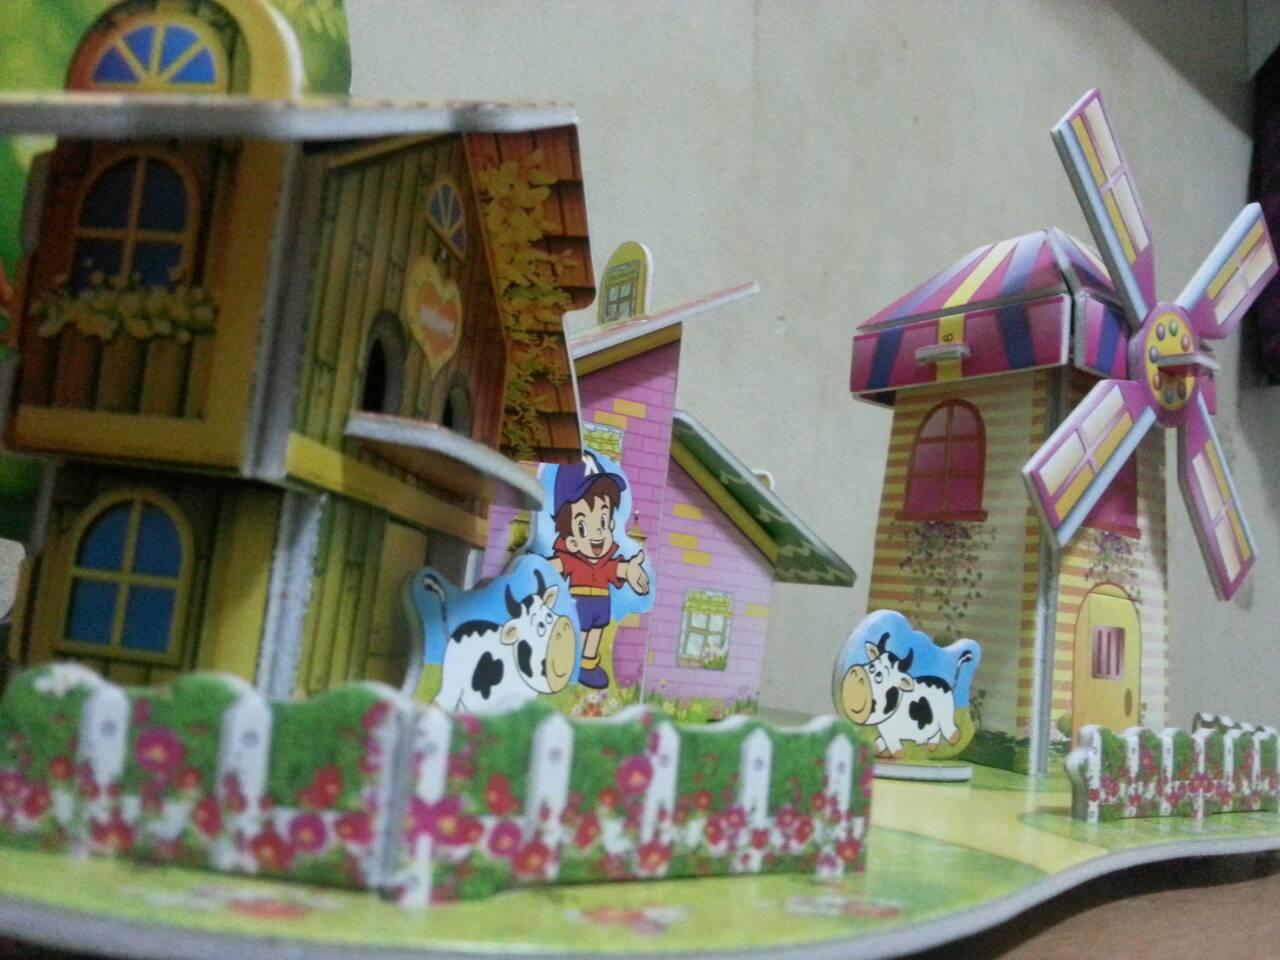 Review โมเดล 3มิติ จิ๊กซอร์ 3มิติ ชุดตัวต่อกระดาษโฟม Happiness is handmade. DIY